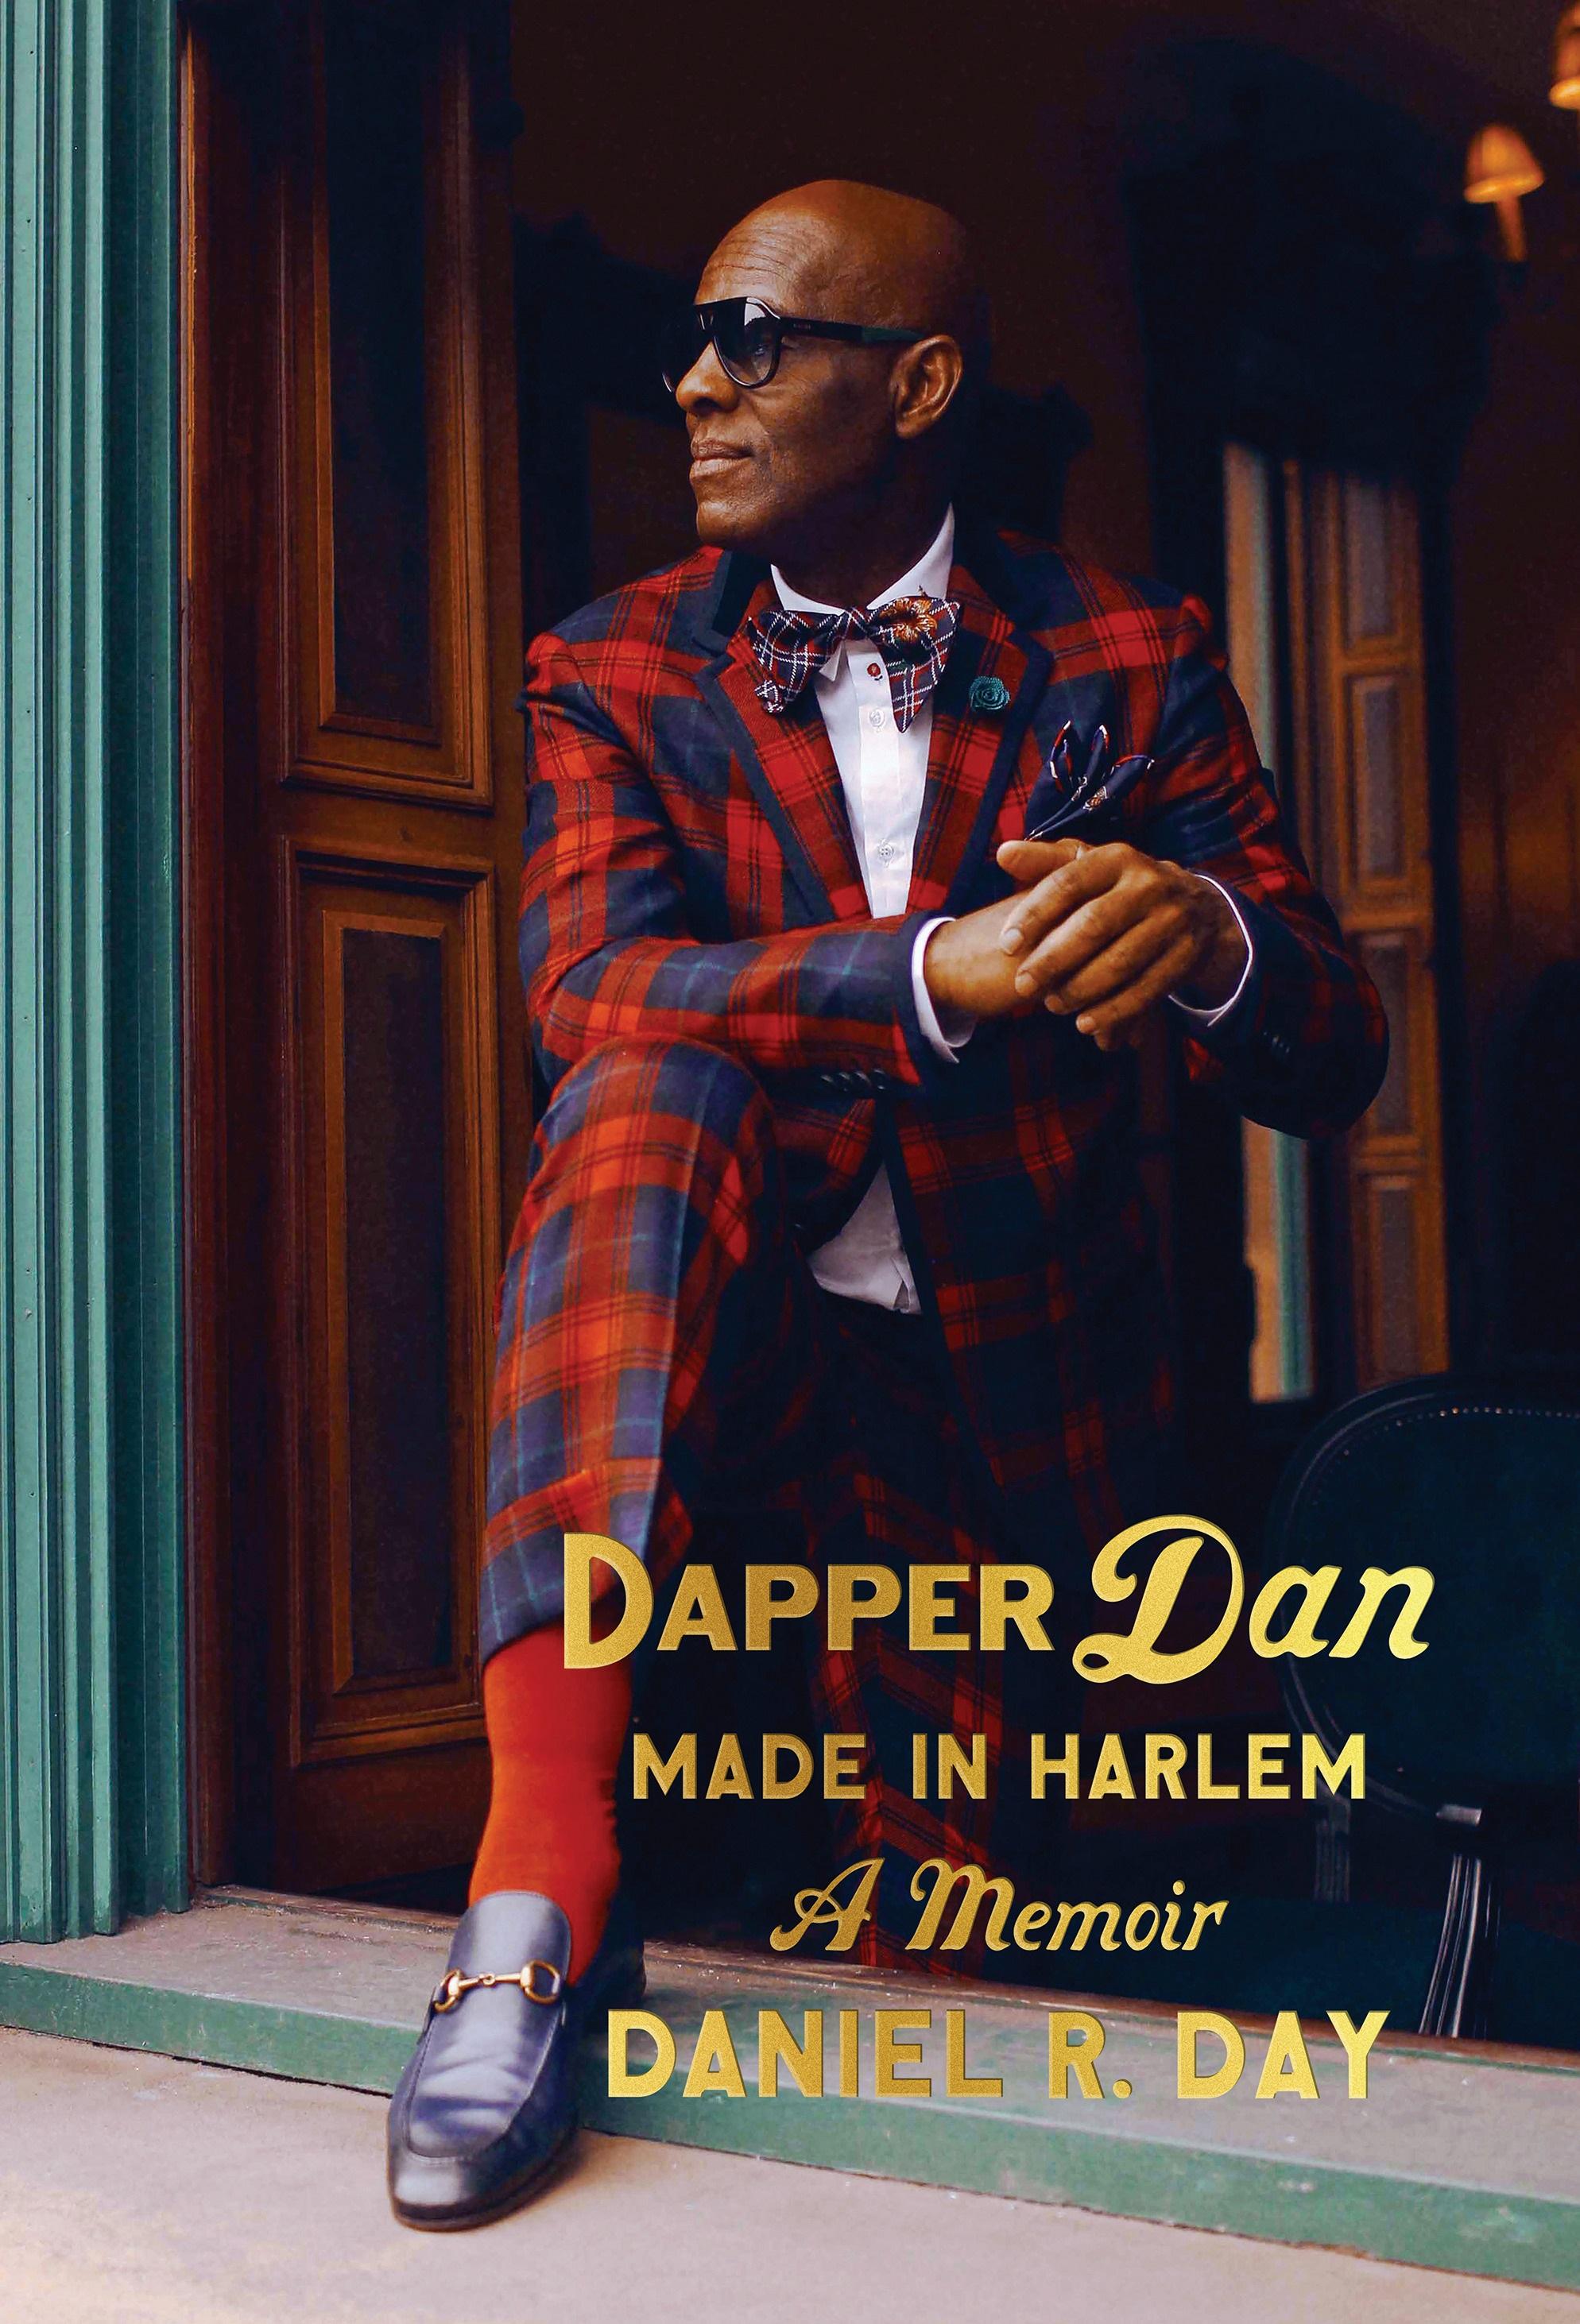 Fashion designer Dapper Dan can thank boxers for his